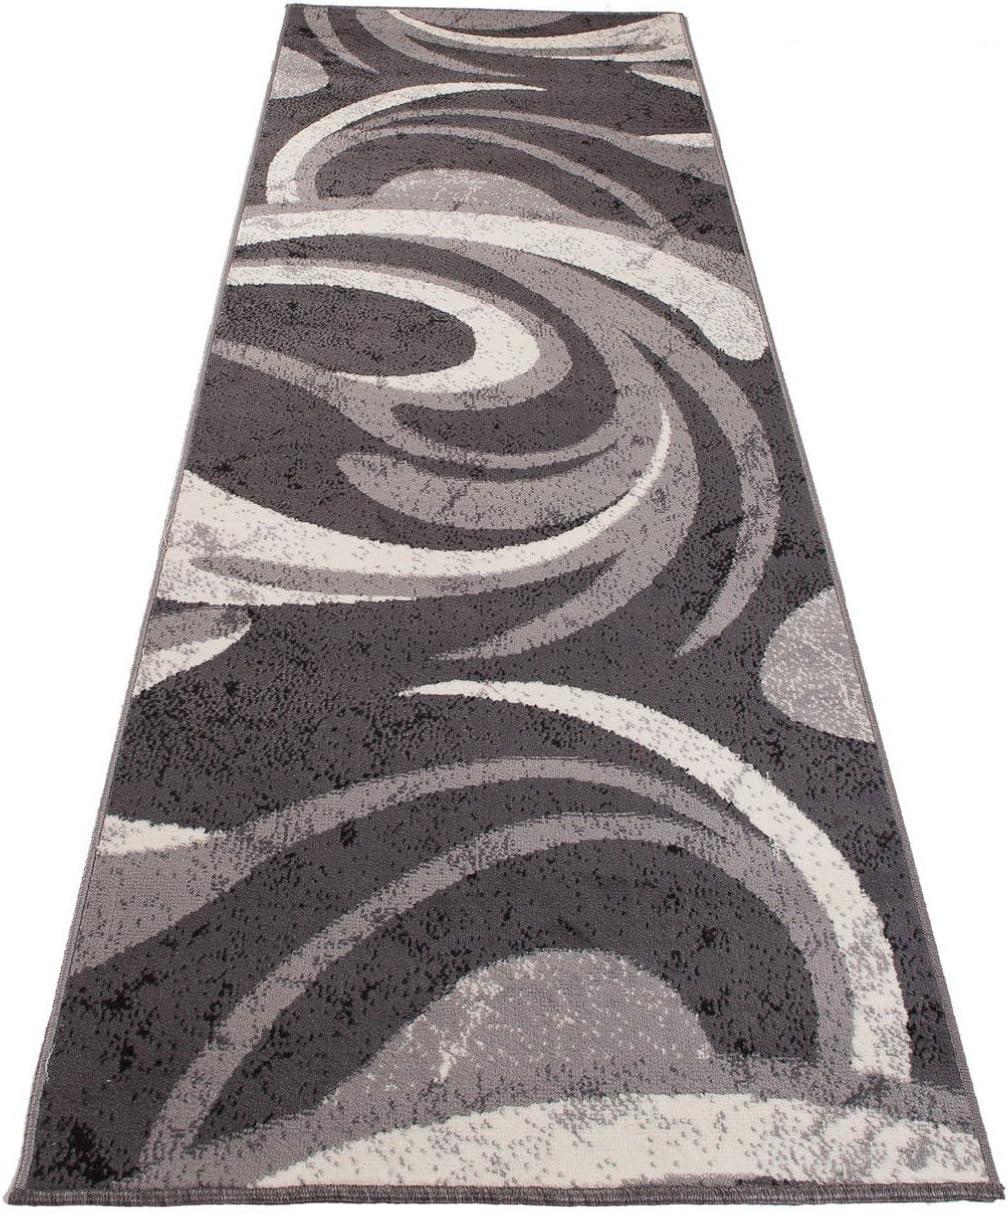 MONACO  70 x 50 cm 2ft4 x 1ft8 Short Perfect For Hall Hallway /& Stairs Grey White Rug Runner Trendy Design Home Carpet Runner Modern Waves Pattern